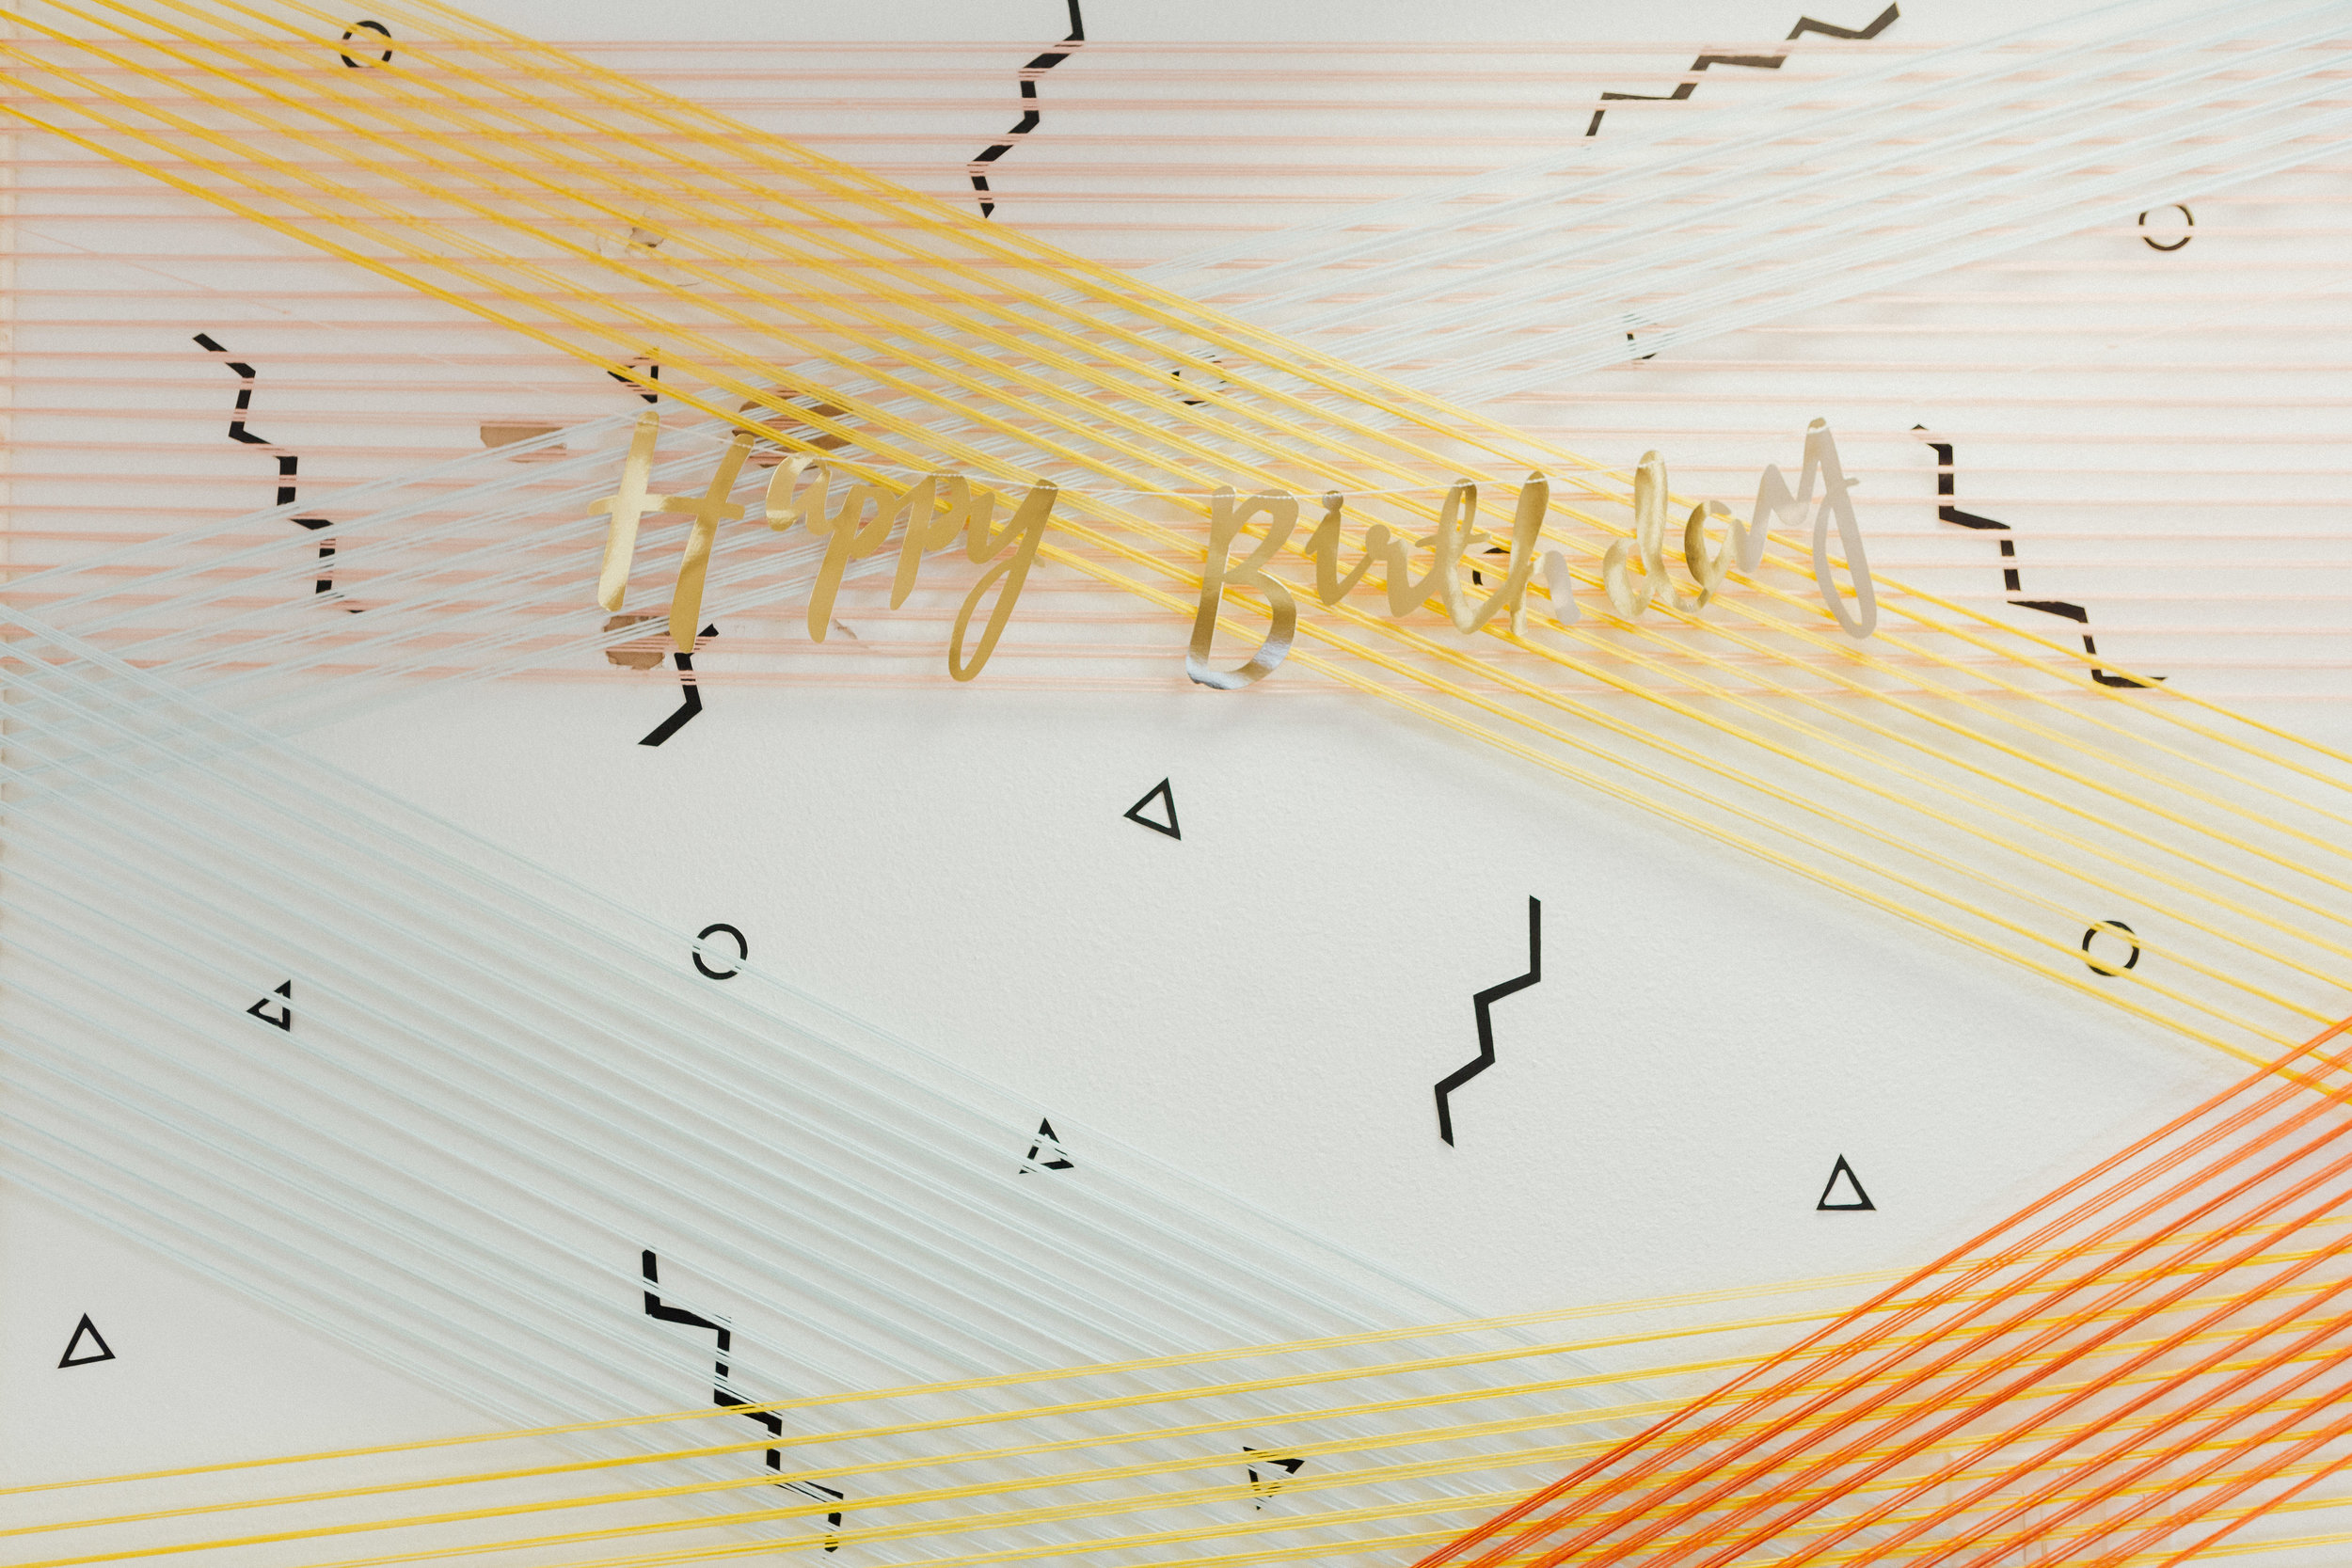 String Art | Relevant + Raw Installation | @RelevantRaw